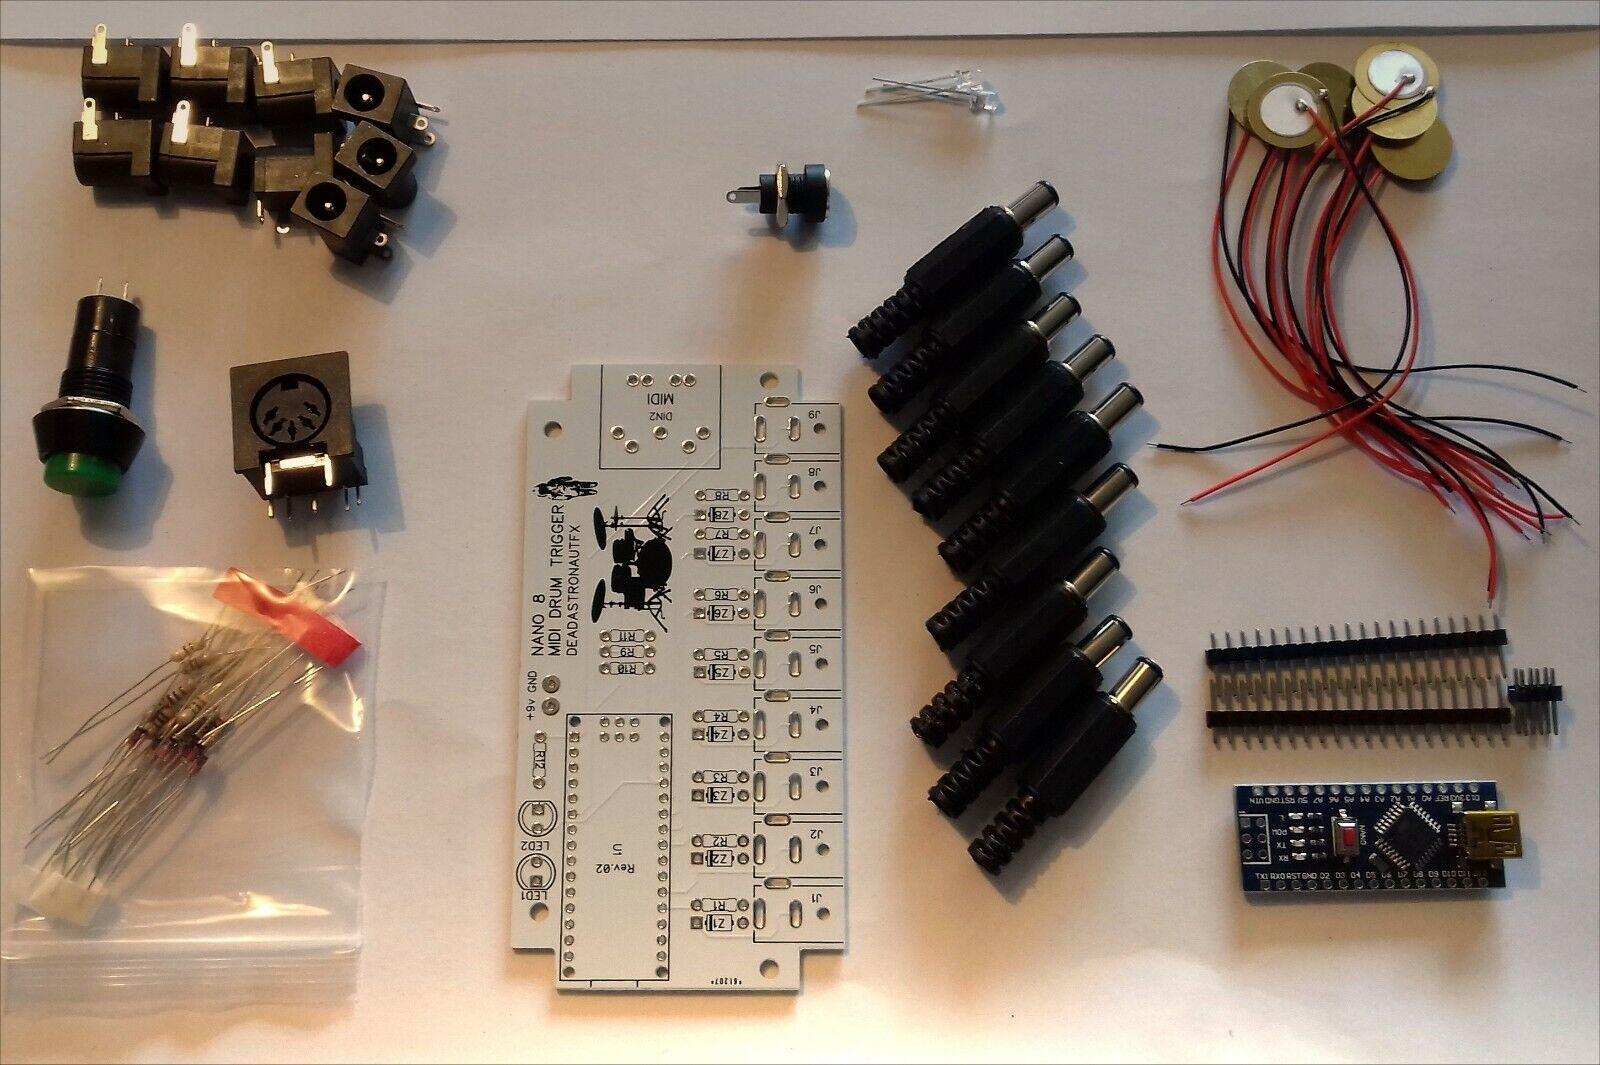 DIY MIDI E-DRUM KIT NANO-8 FULL COMPLETE KIT (MIDI DRUM BRAIN)